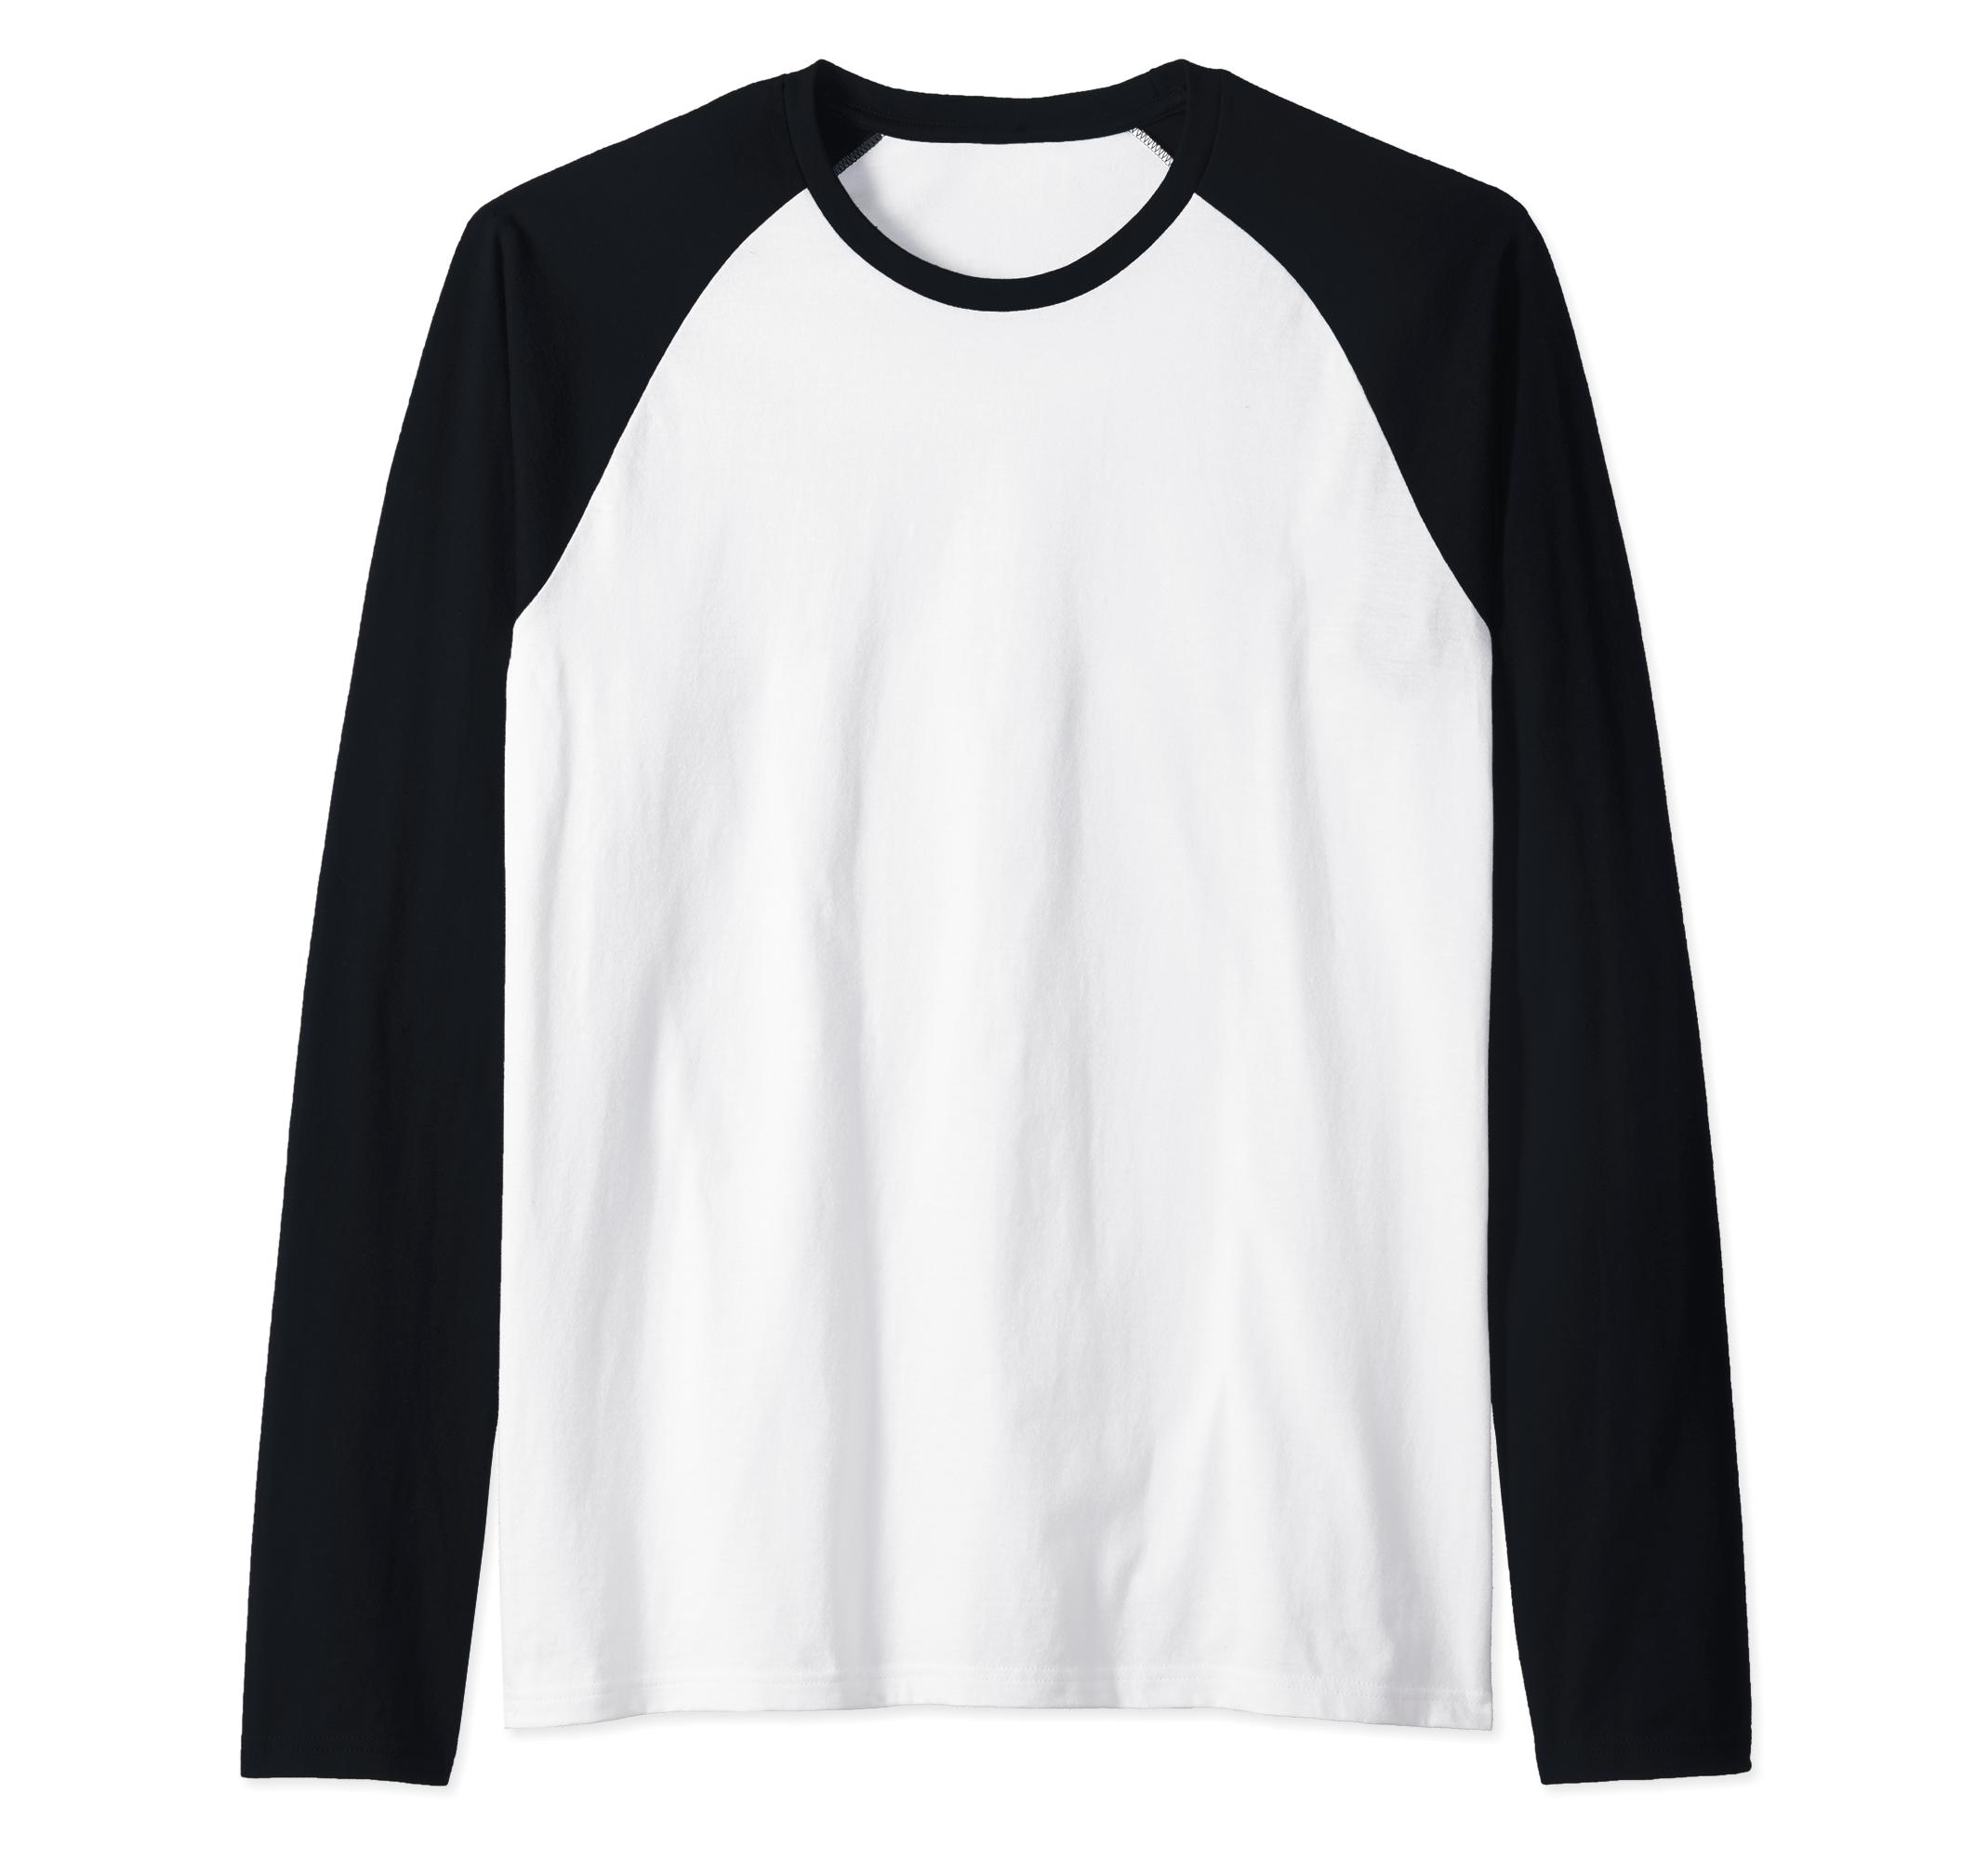 Gangsta T-Shirt Gift Present Funny Rapper Gangster Music